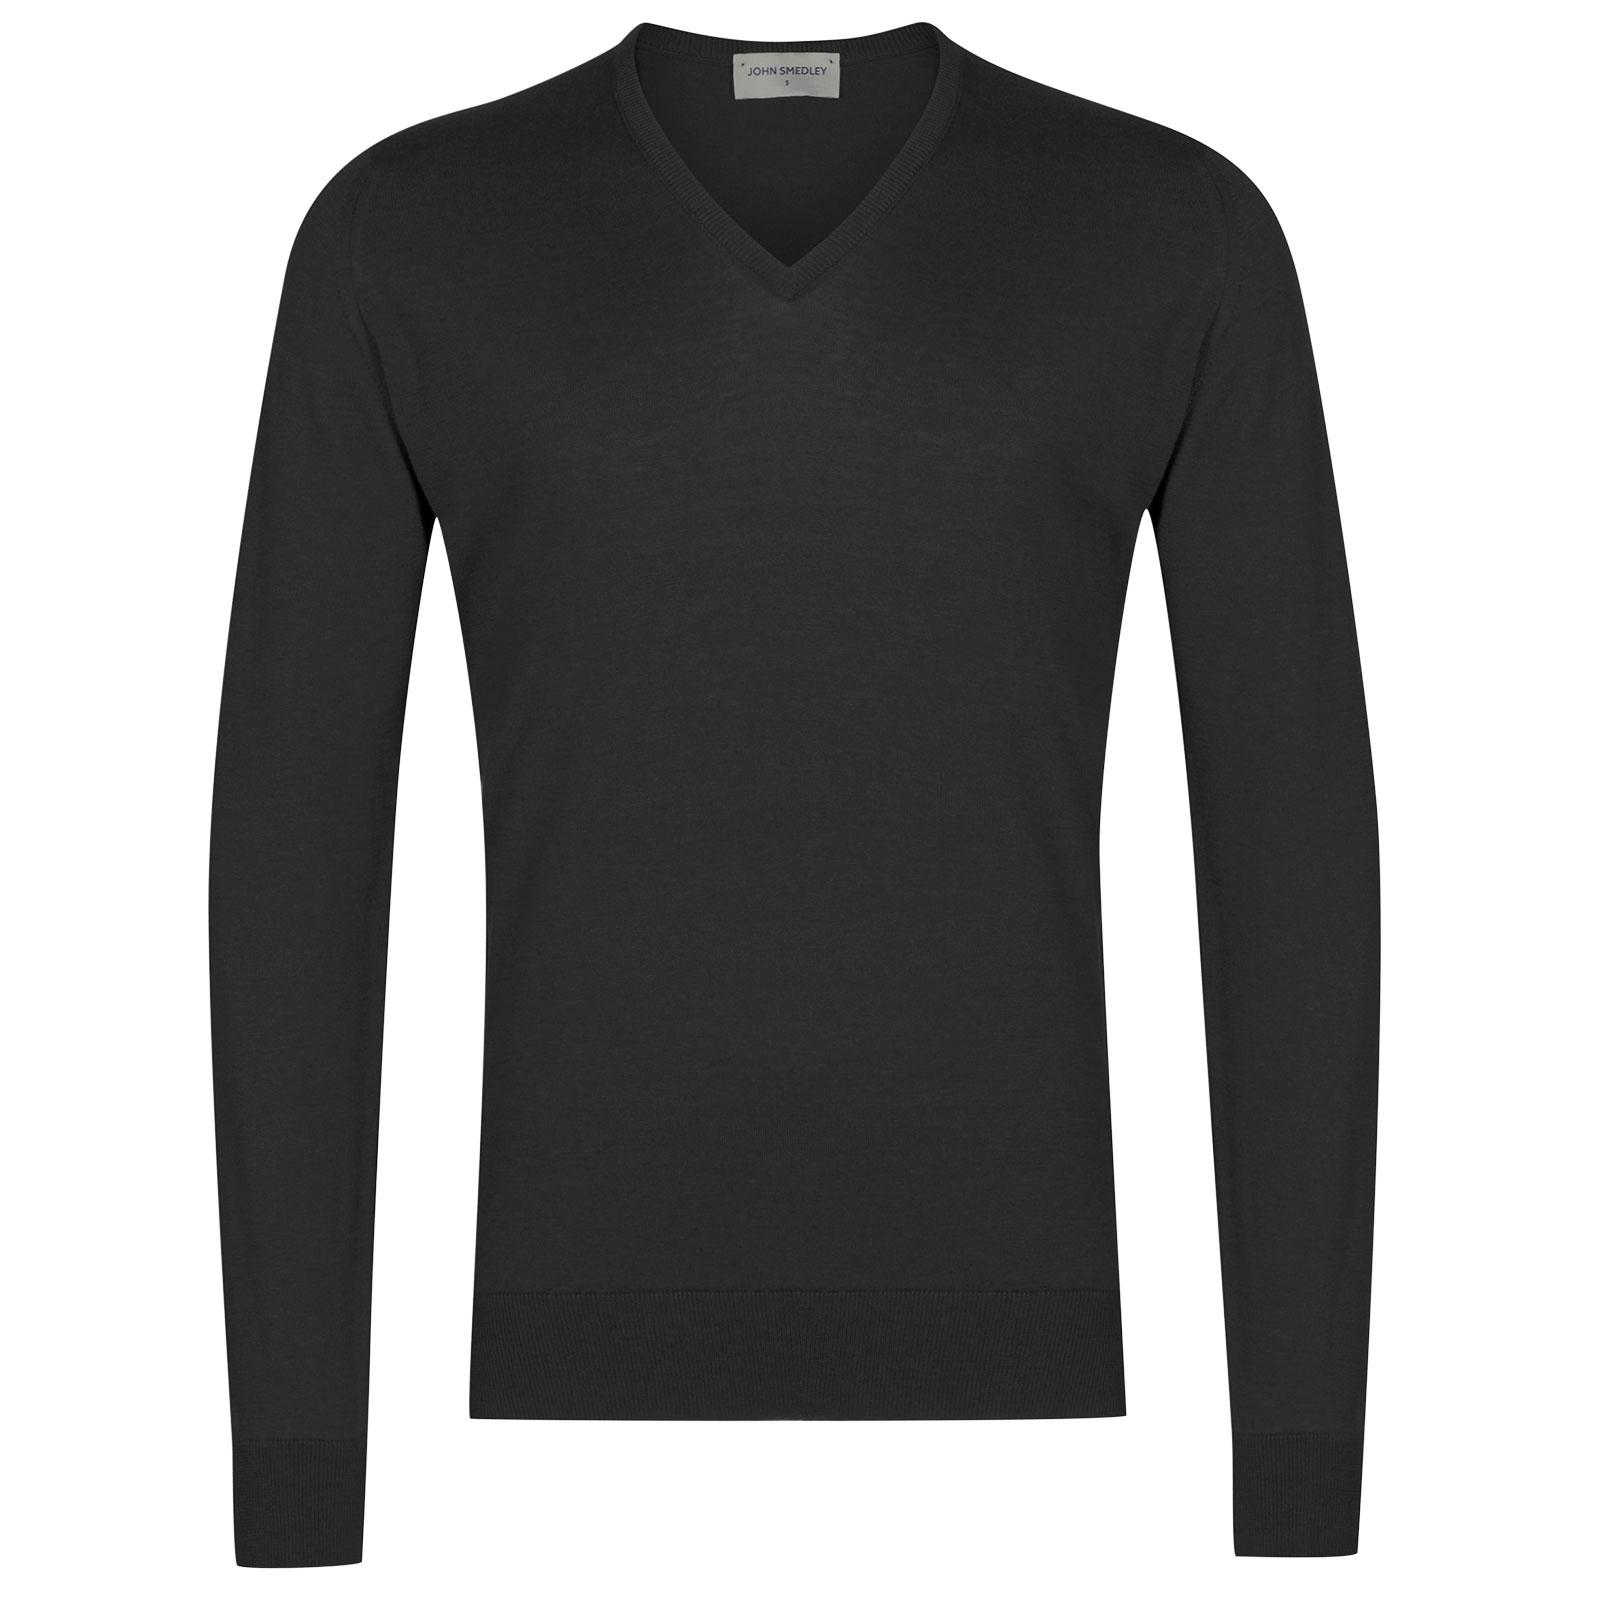 John Smedley Woburn Sea Island Cotton Pullover in Flannel Grey-S